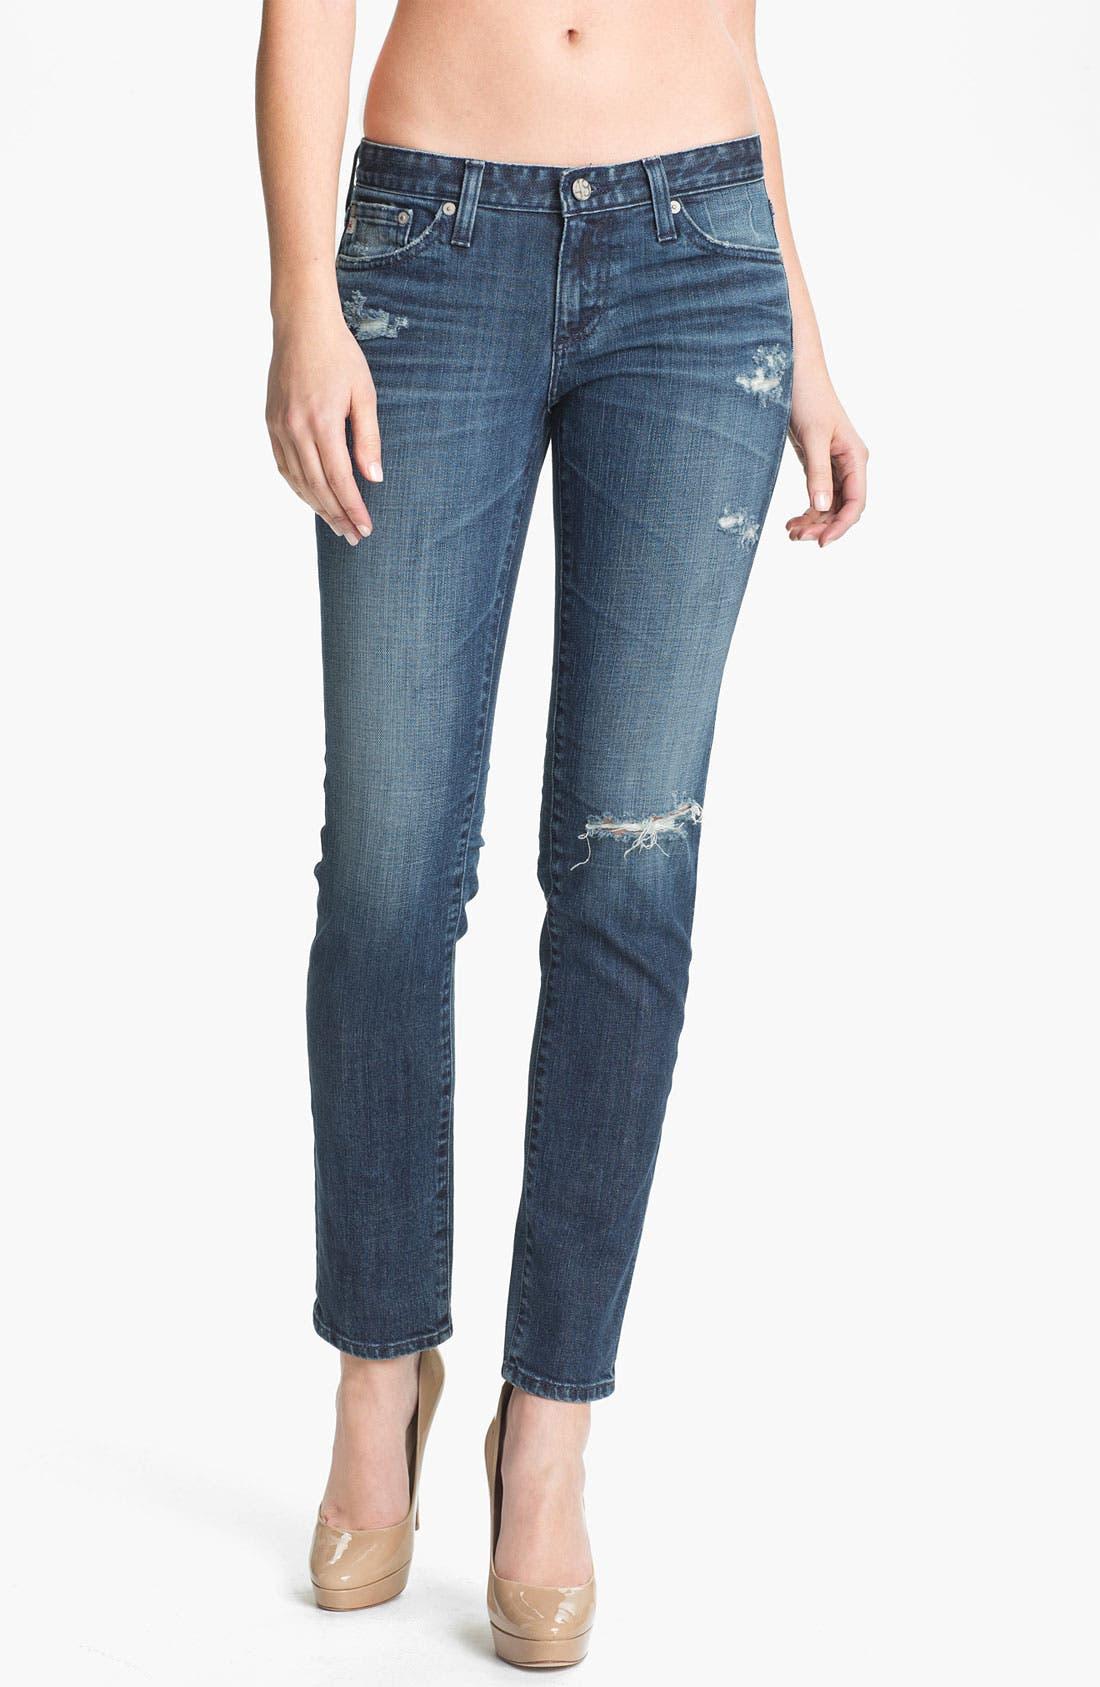 Main Image - AG Jeans 'The Stilt' Cigarette Leg Stretch Jeans (7 Year Destroy)